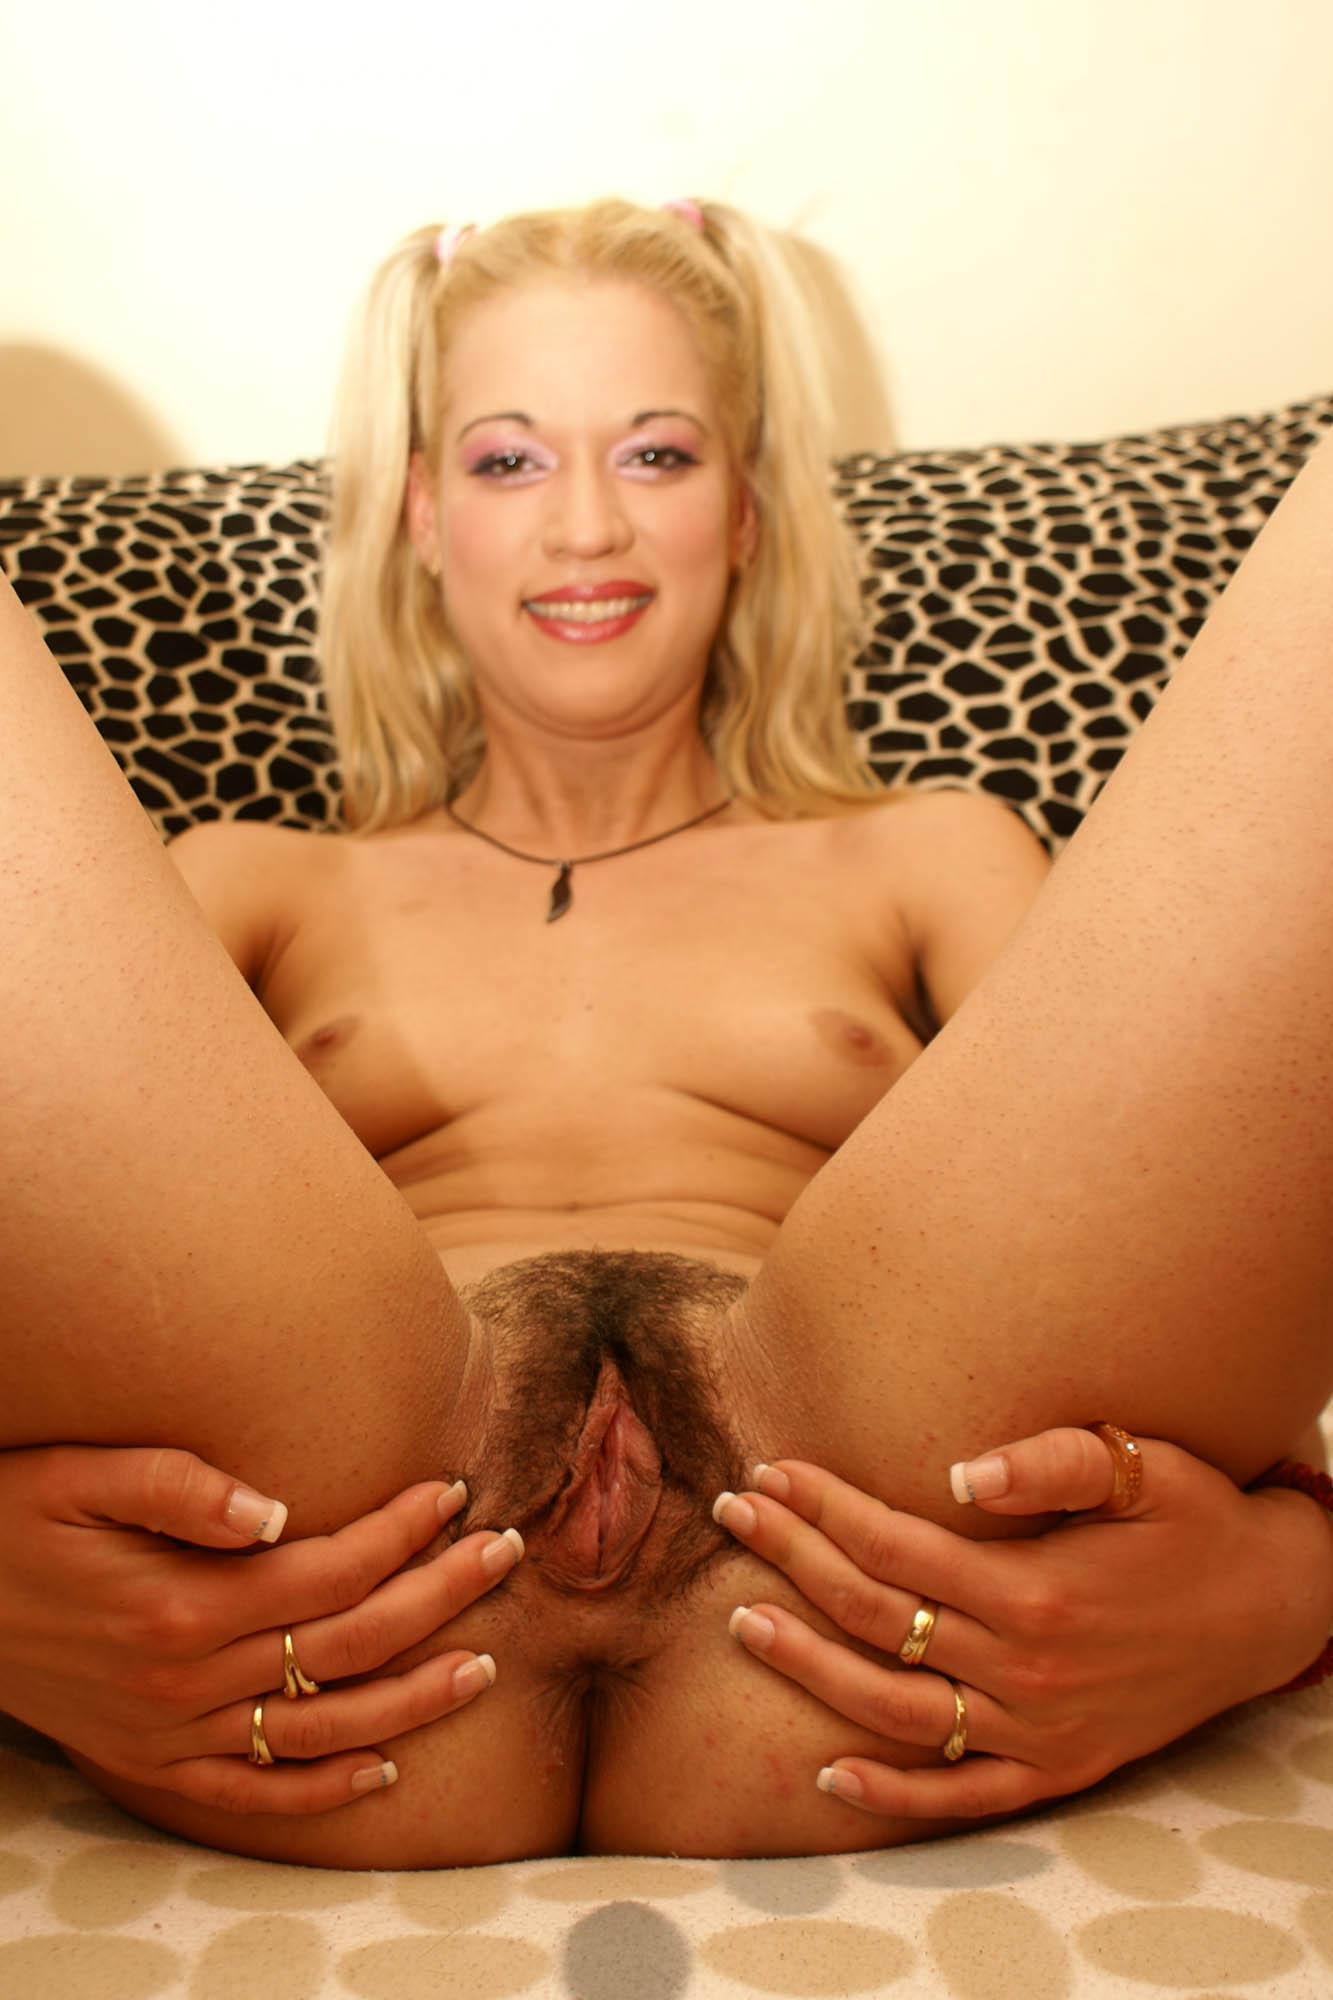 wild-horney-pussy-amy-sue-cooper-nude-pics